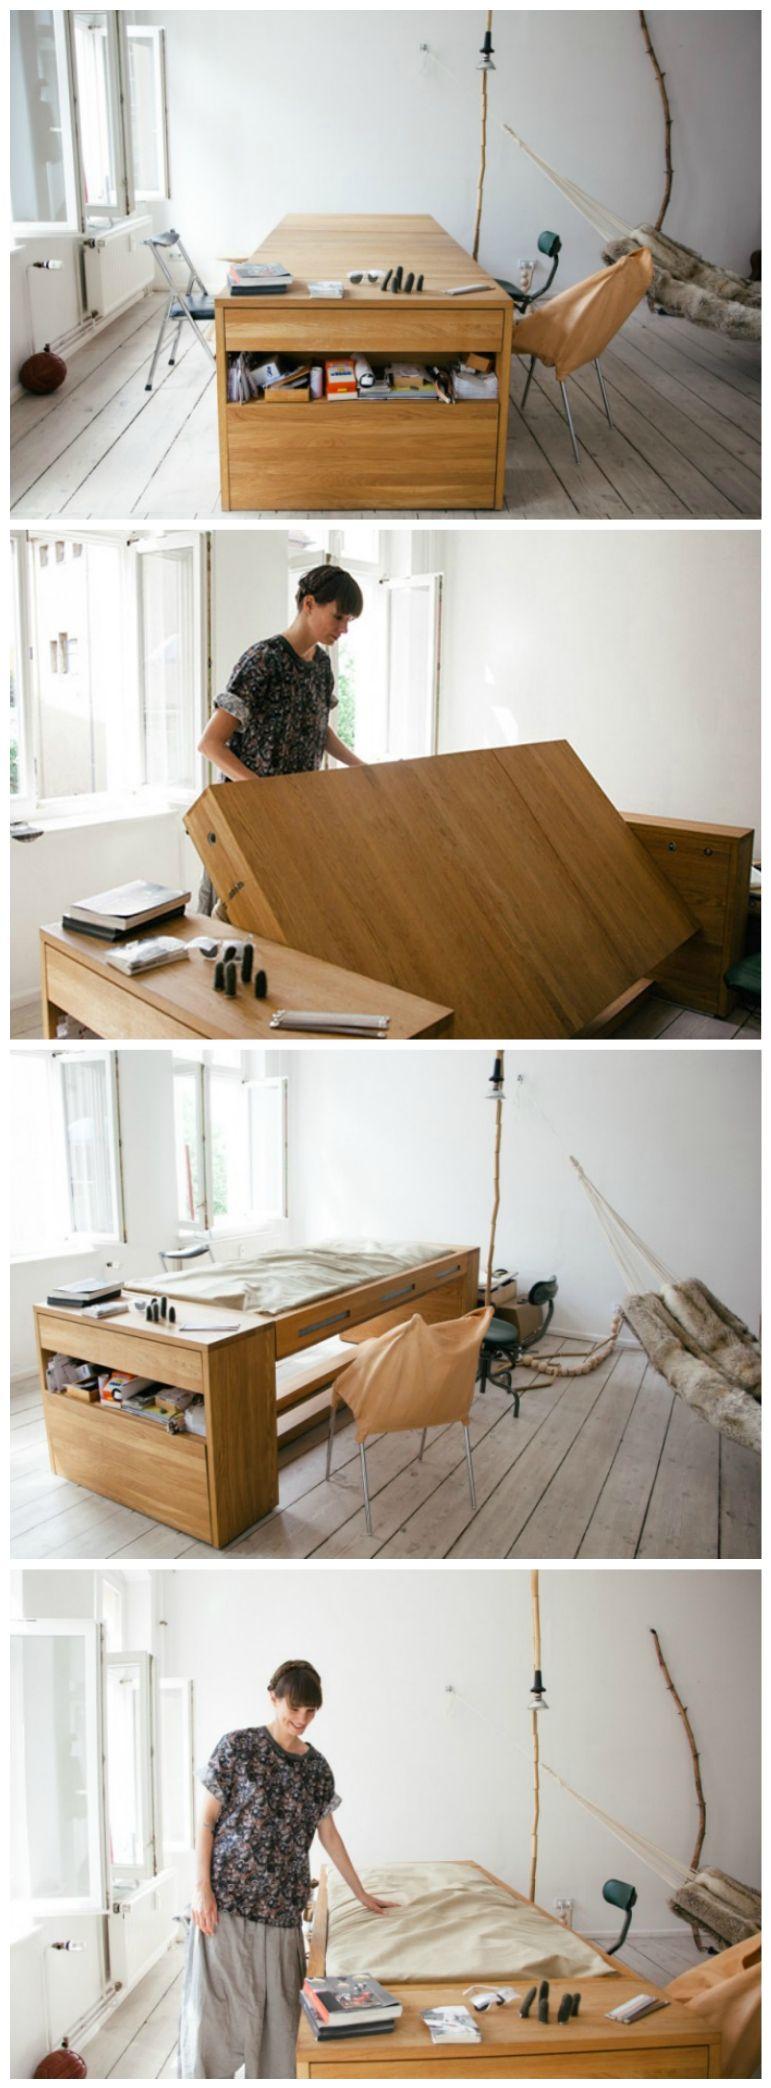 Space Saving Idea A Desk That Transforms into a Bed